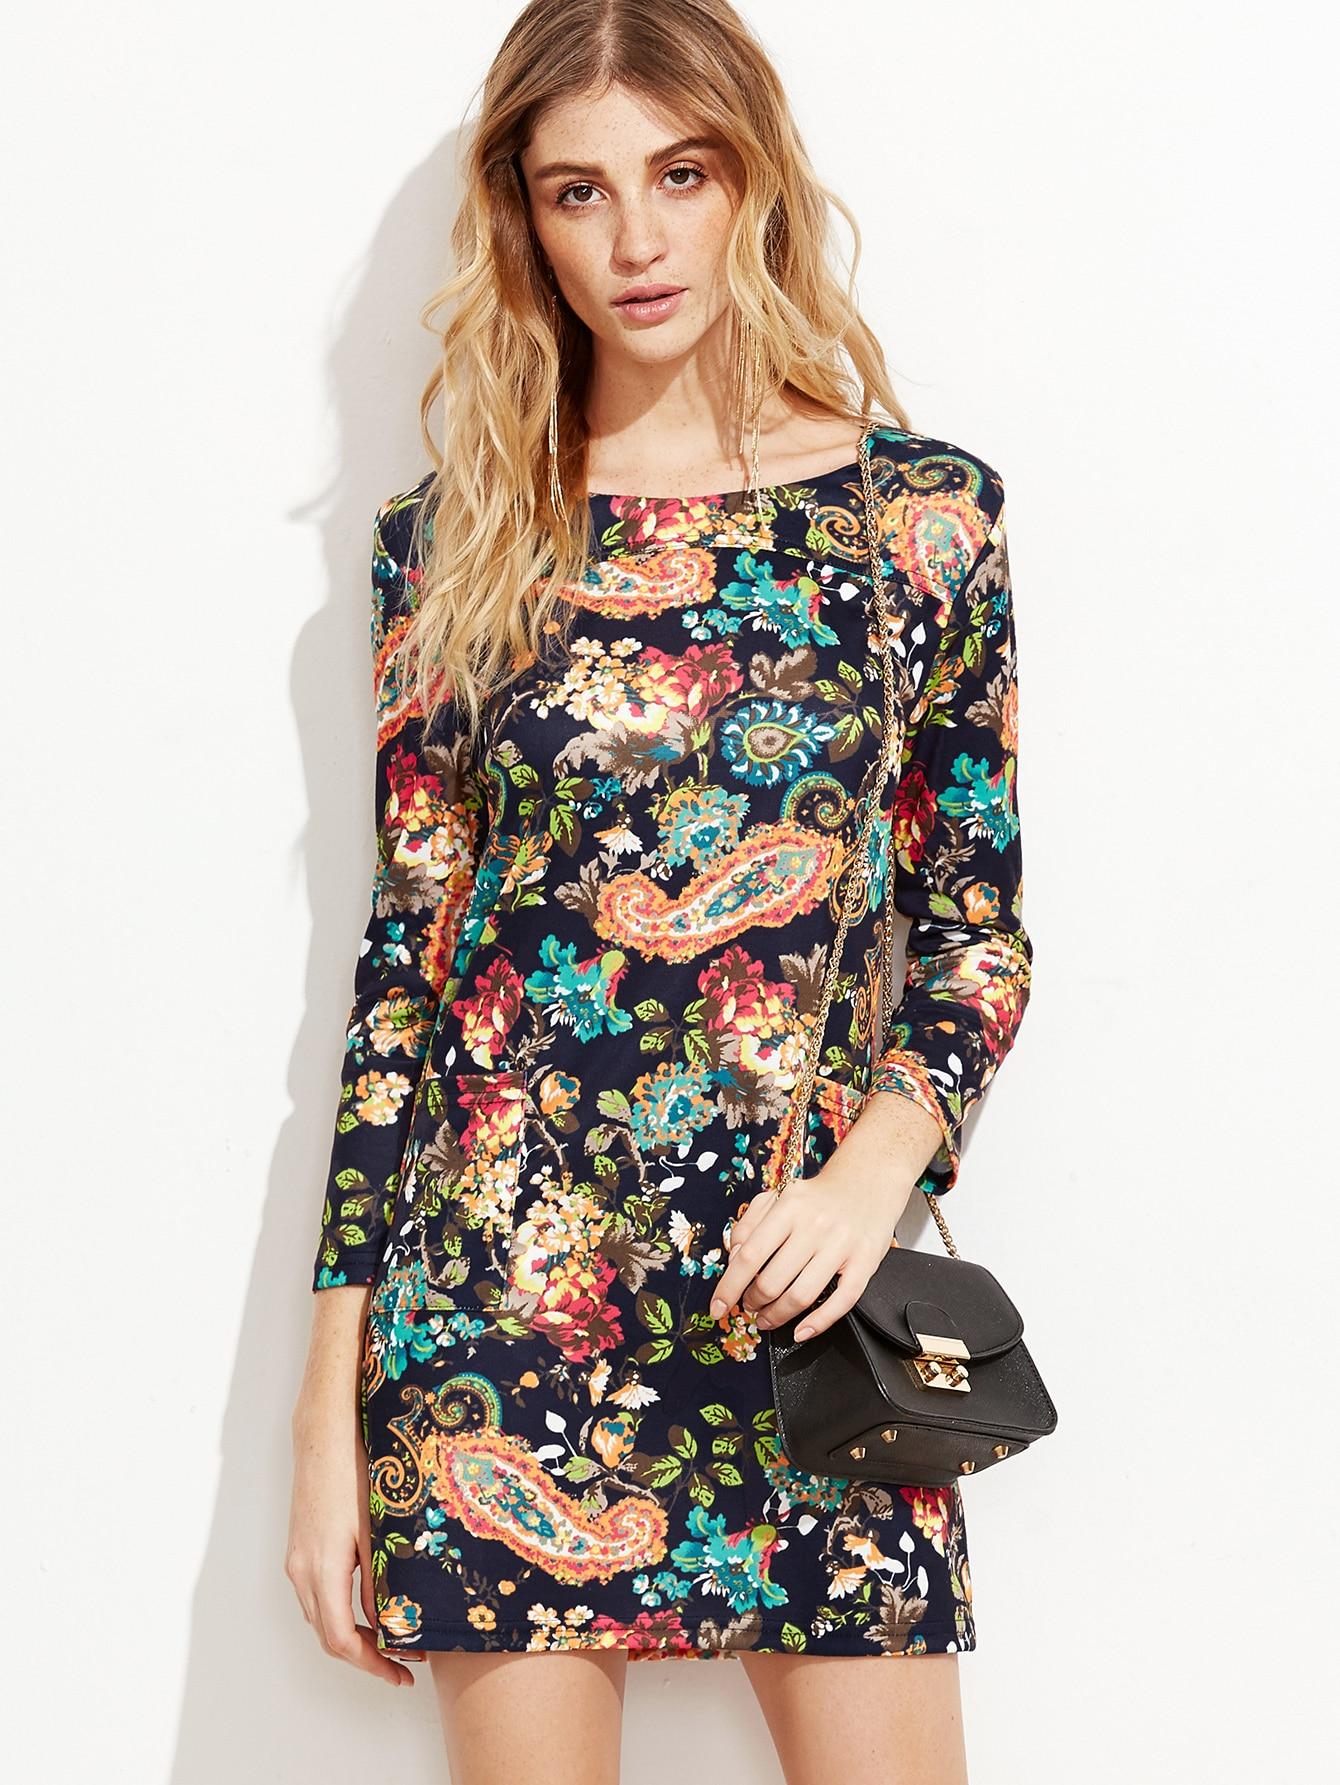 Floral Print Pockets Shift DressFloral Print Pockets Shift Dress<br><br>color: Multicolor<br>size: M,XXXL